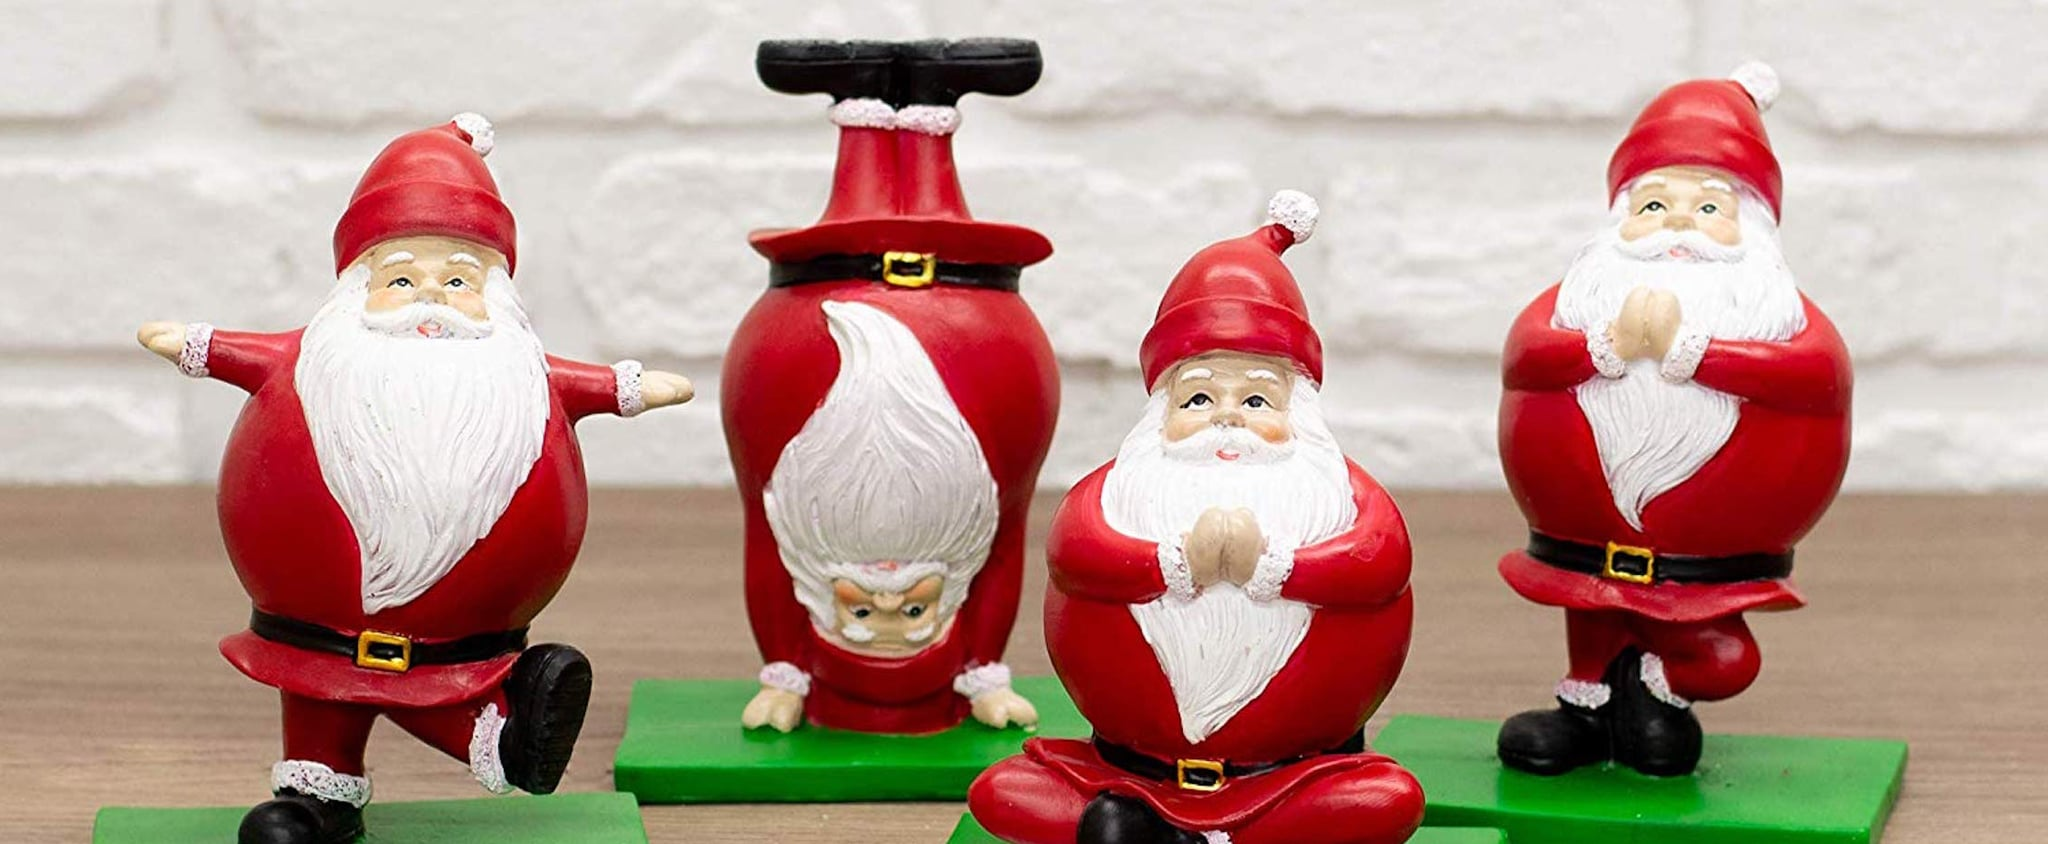 Amazon's Selling the Cutest Yoga Santa Claus Figurines